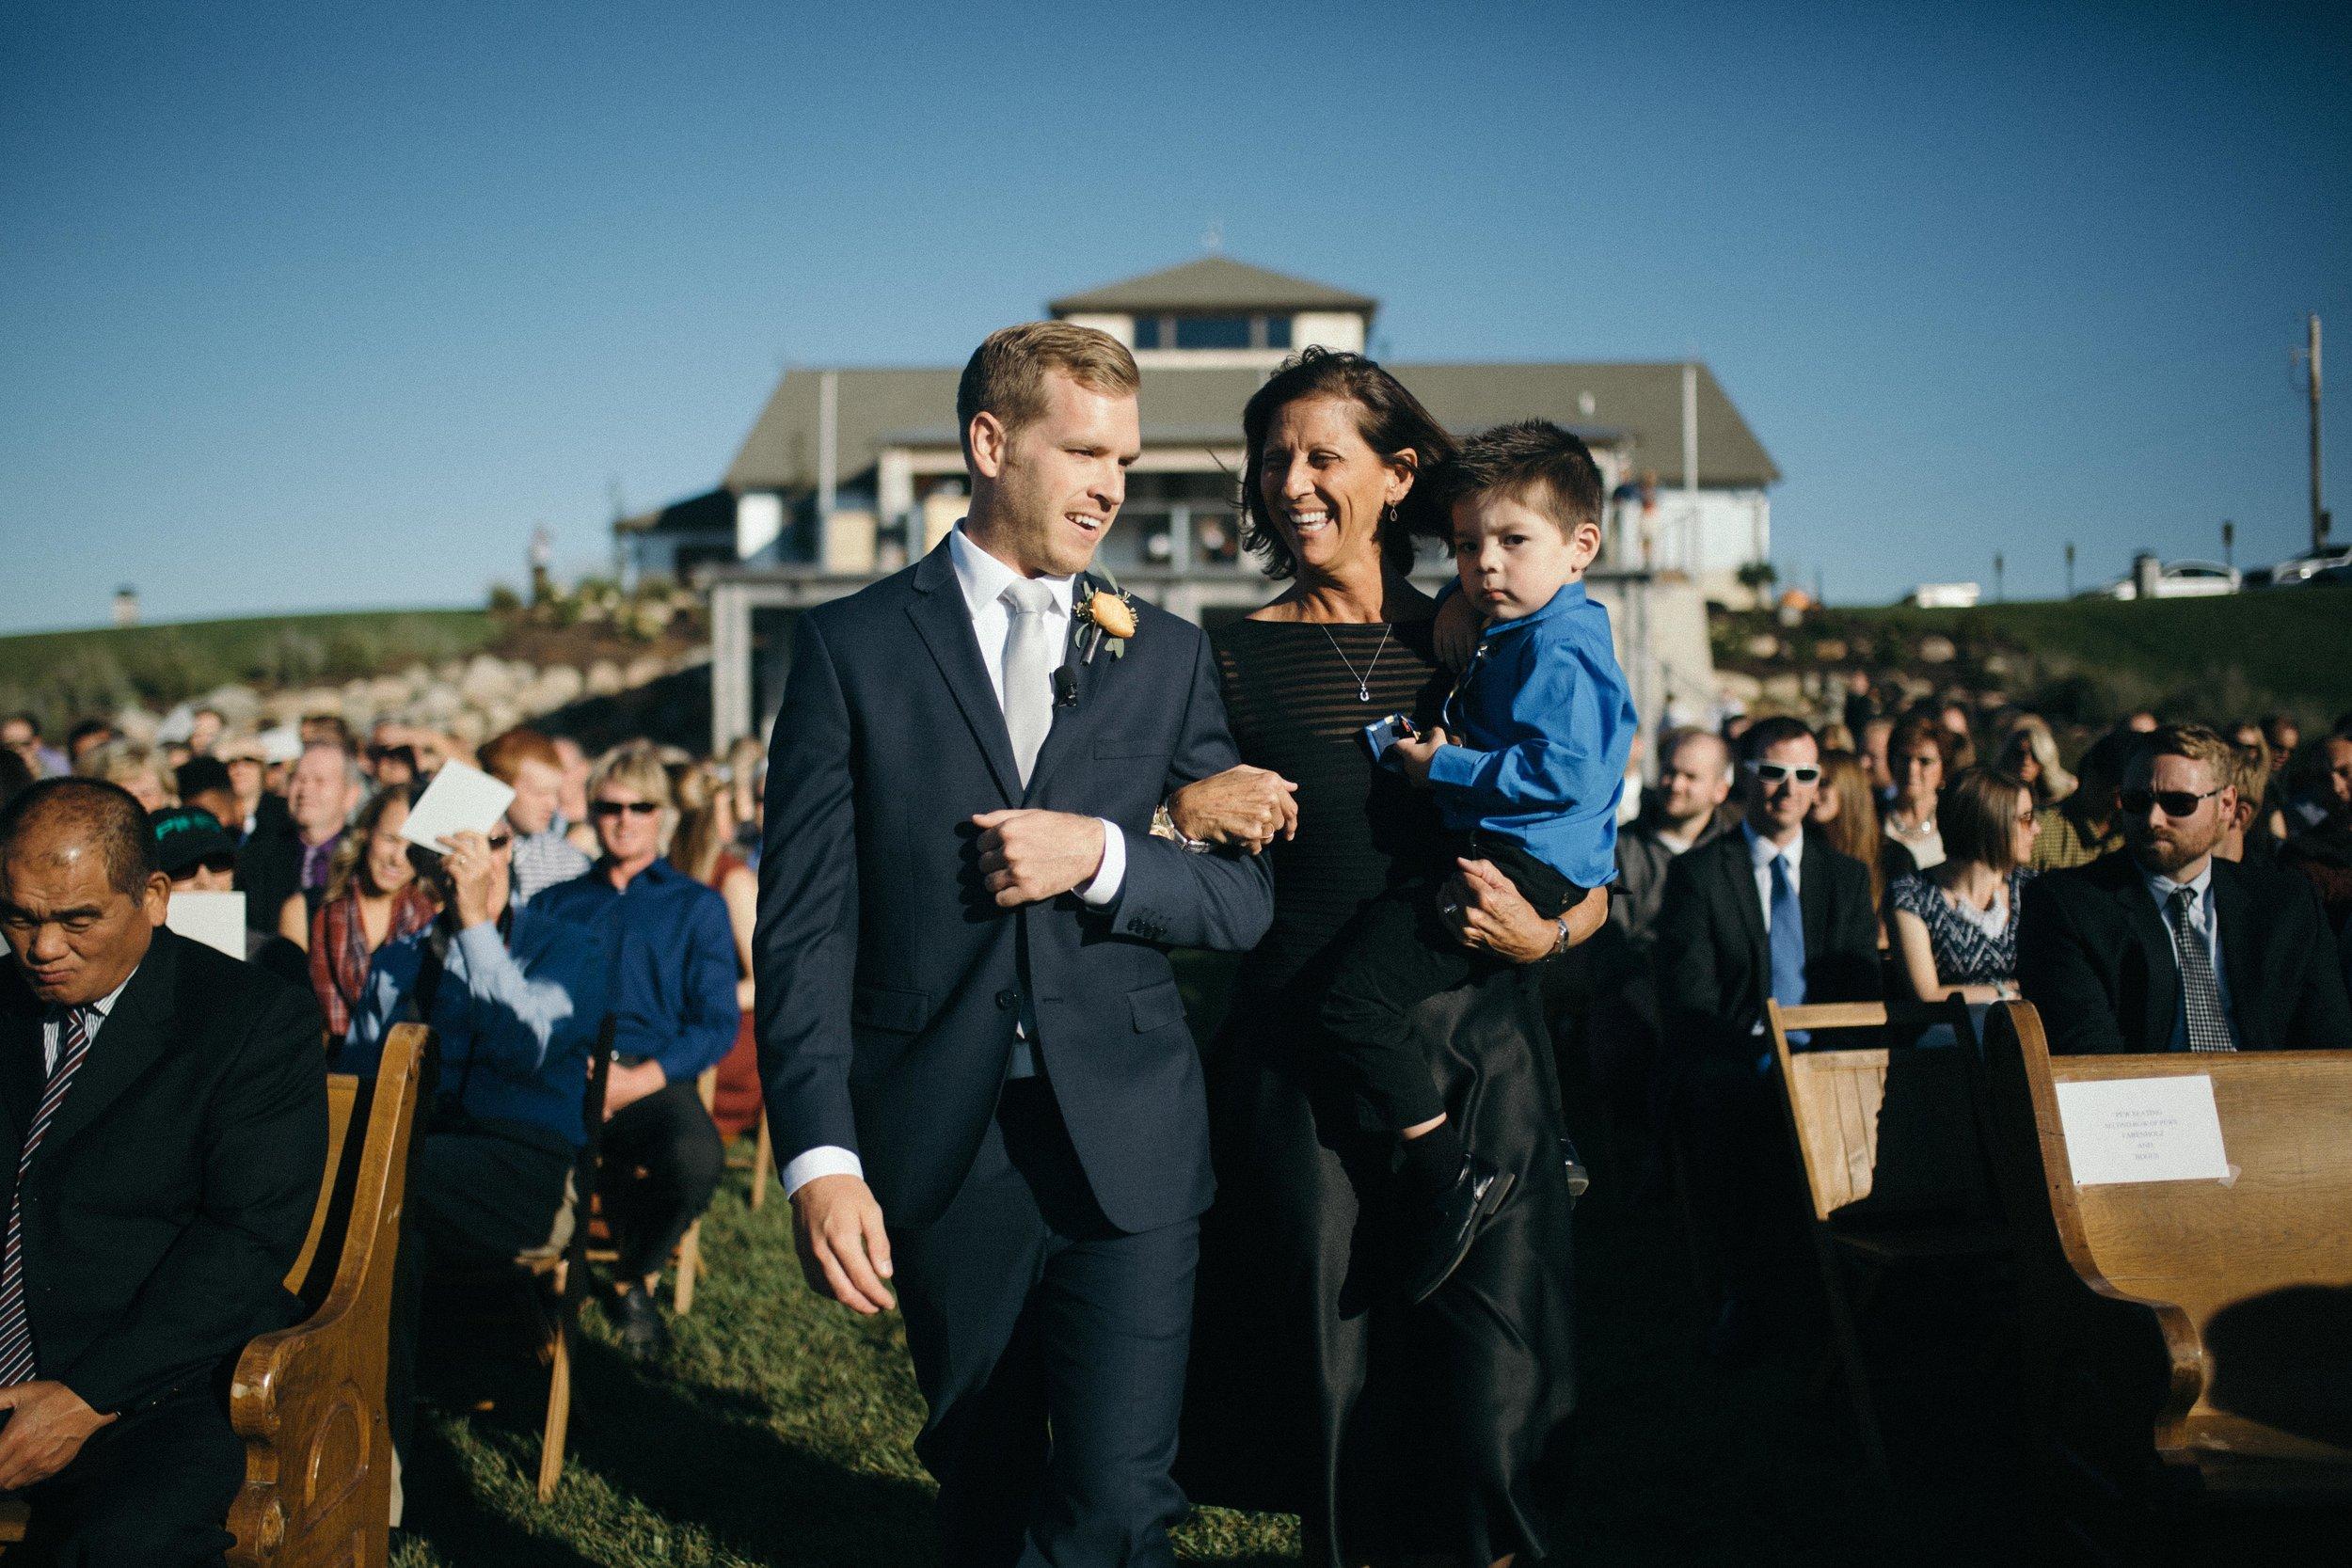 bailey-jared-wedding-blog-51.jpg